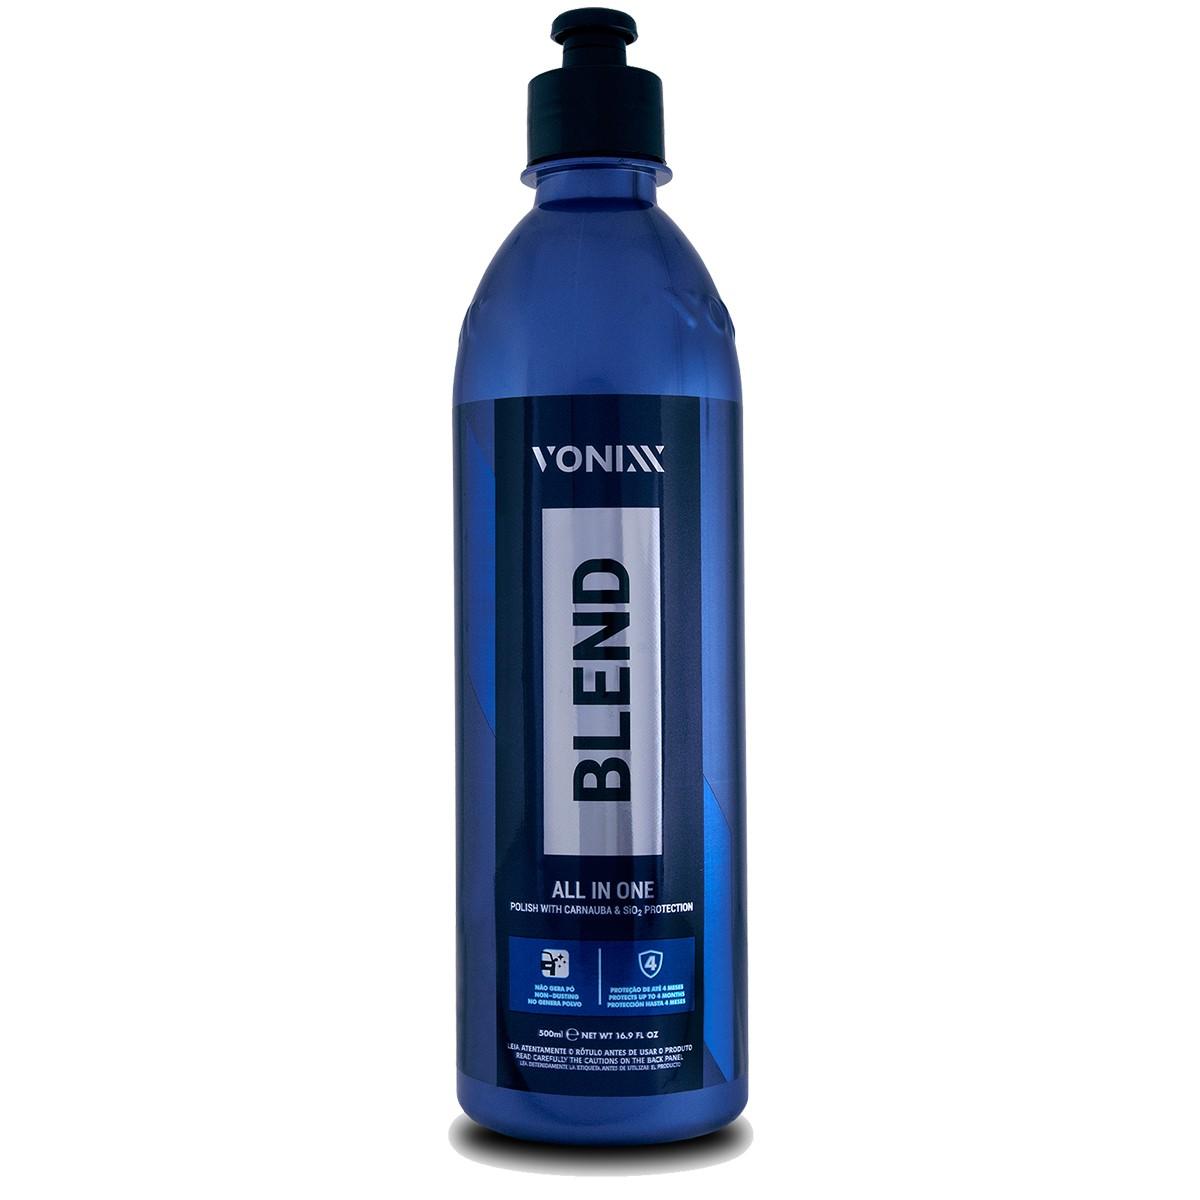 Blend All In One 500ml ( Polidor de Etapa Única) - Vonixx